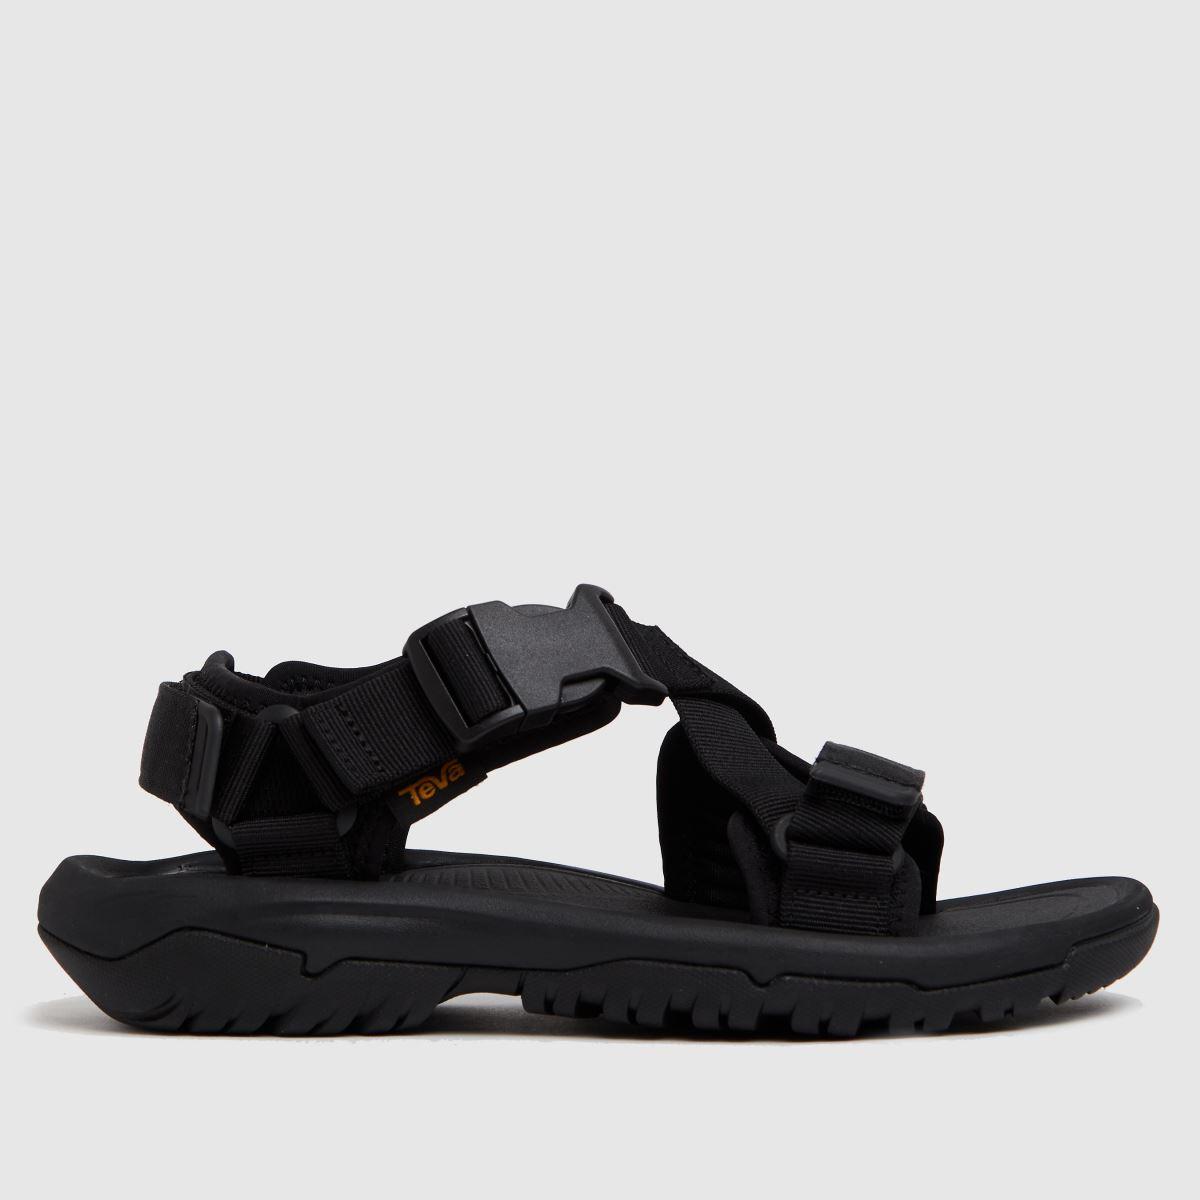 Teva Black Performance Hurricane Verge Sandals